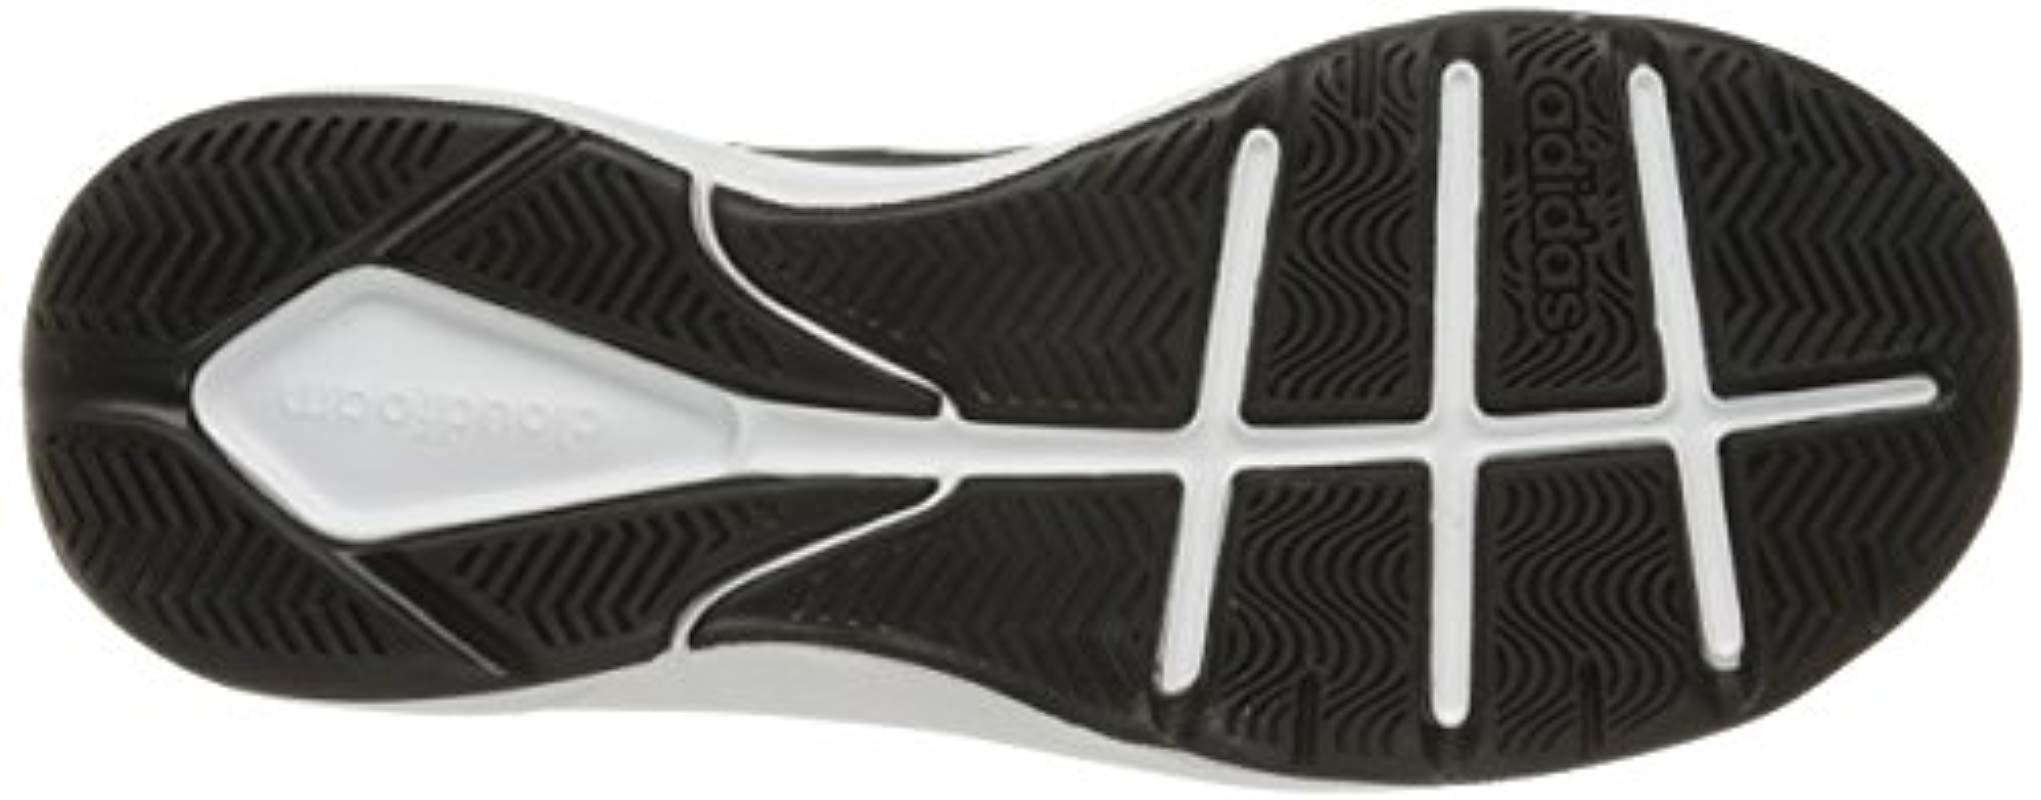 Neo Cloudfoam Ilation Mid Wide Basketball Shoe